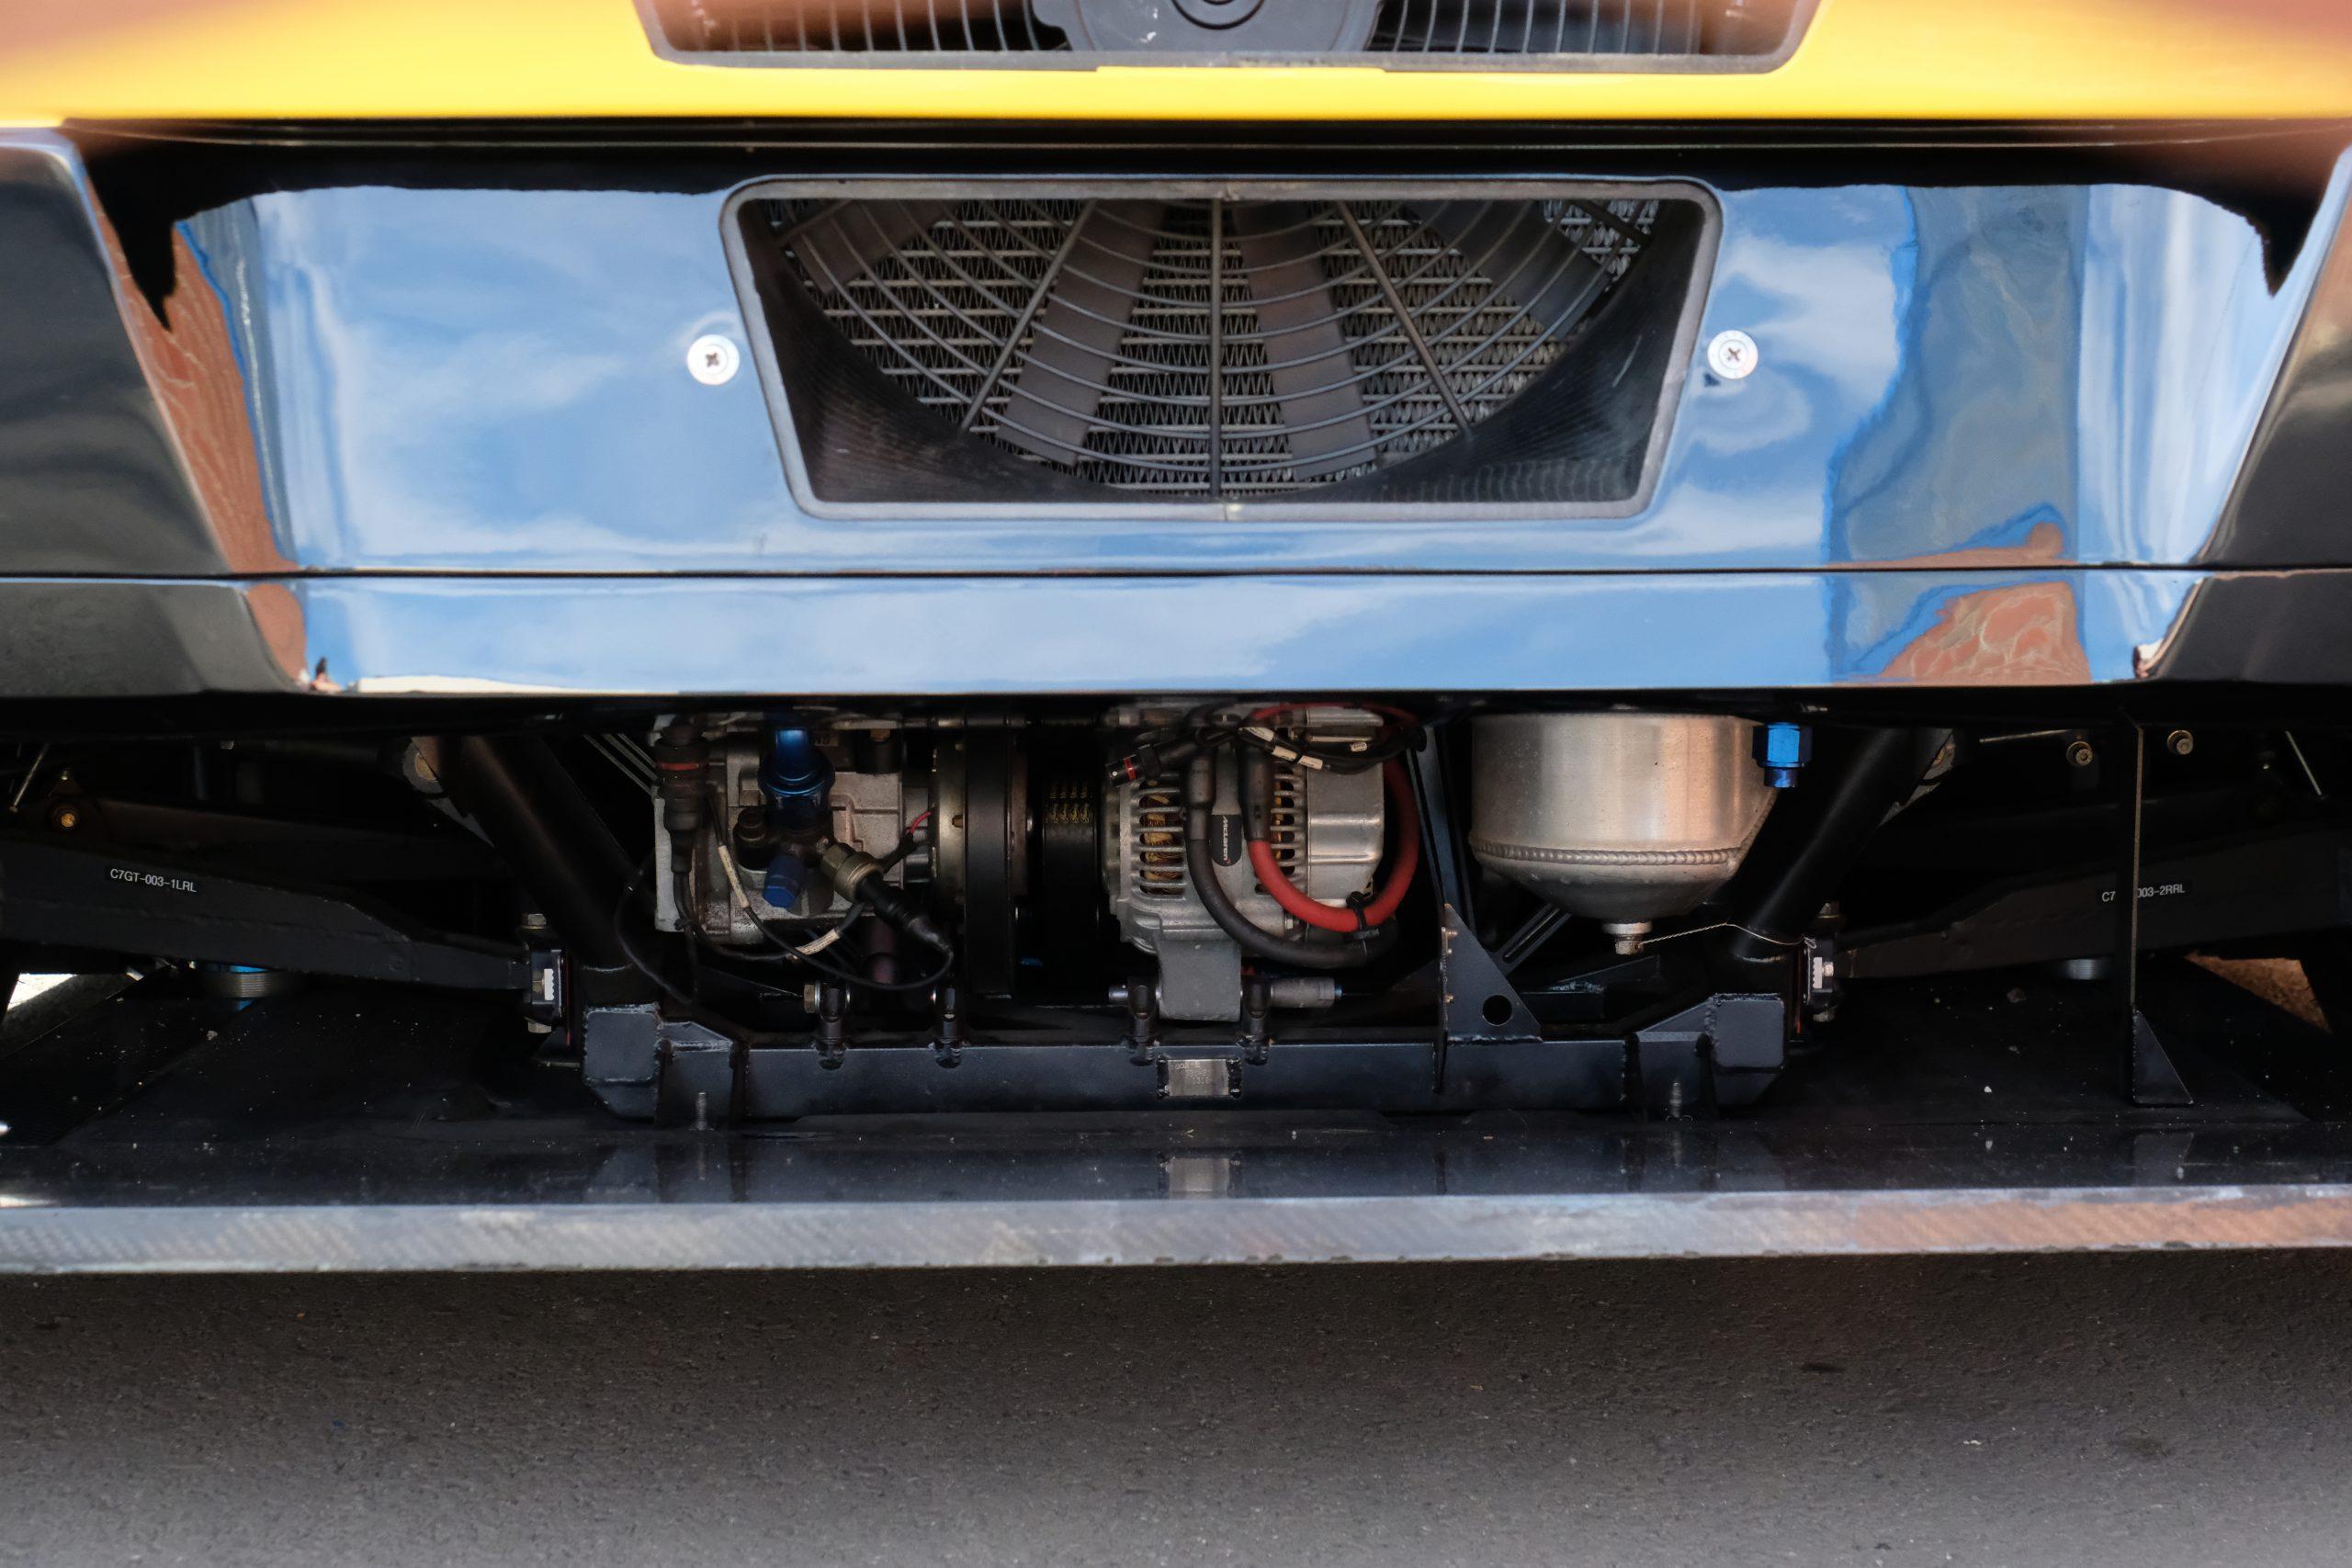 2015 corvette c7.r rear fan diffuser